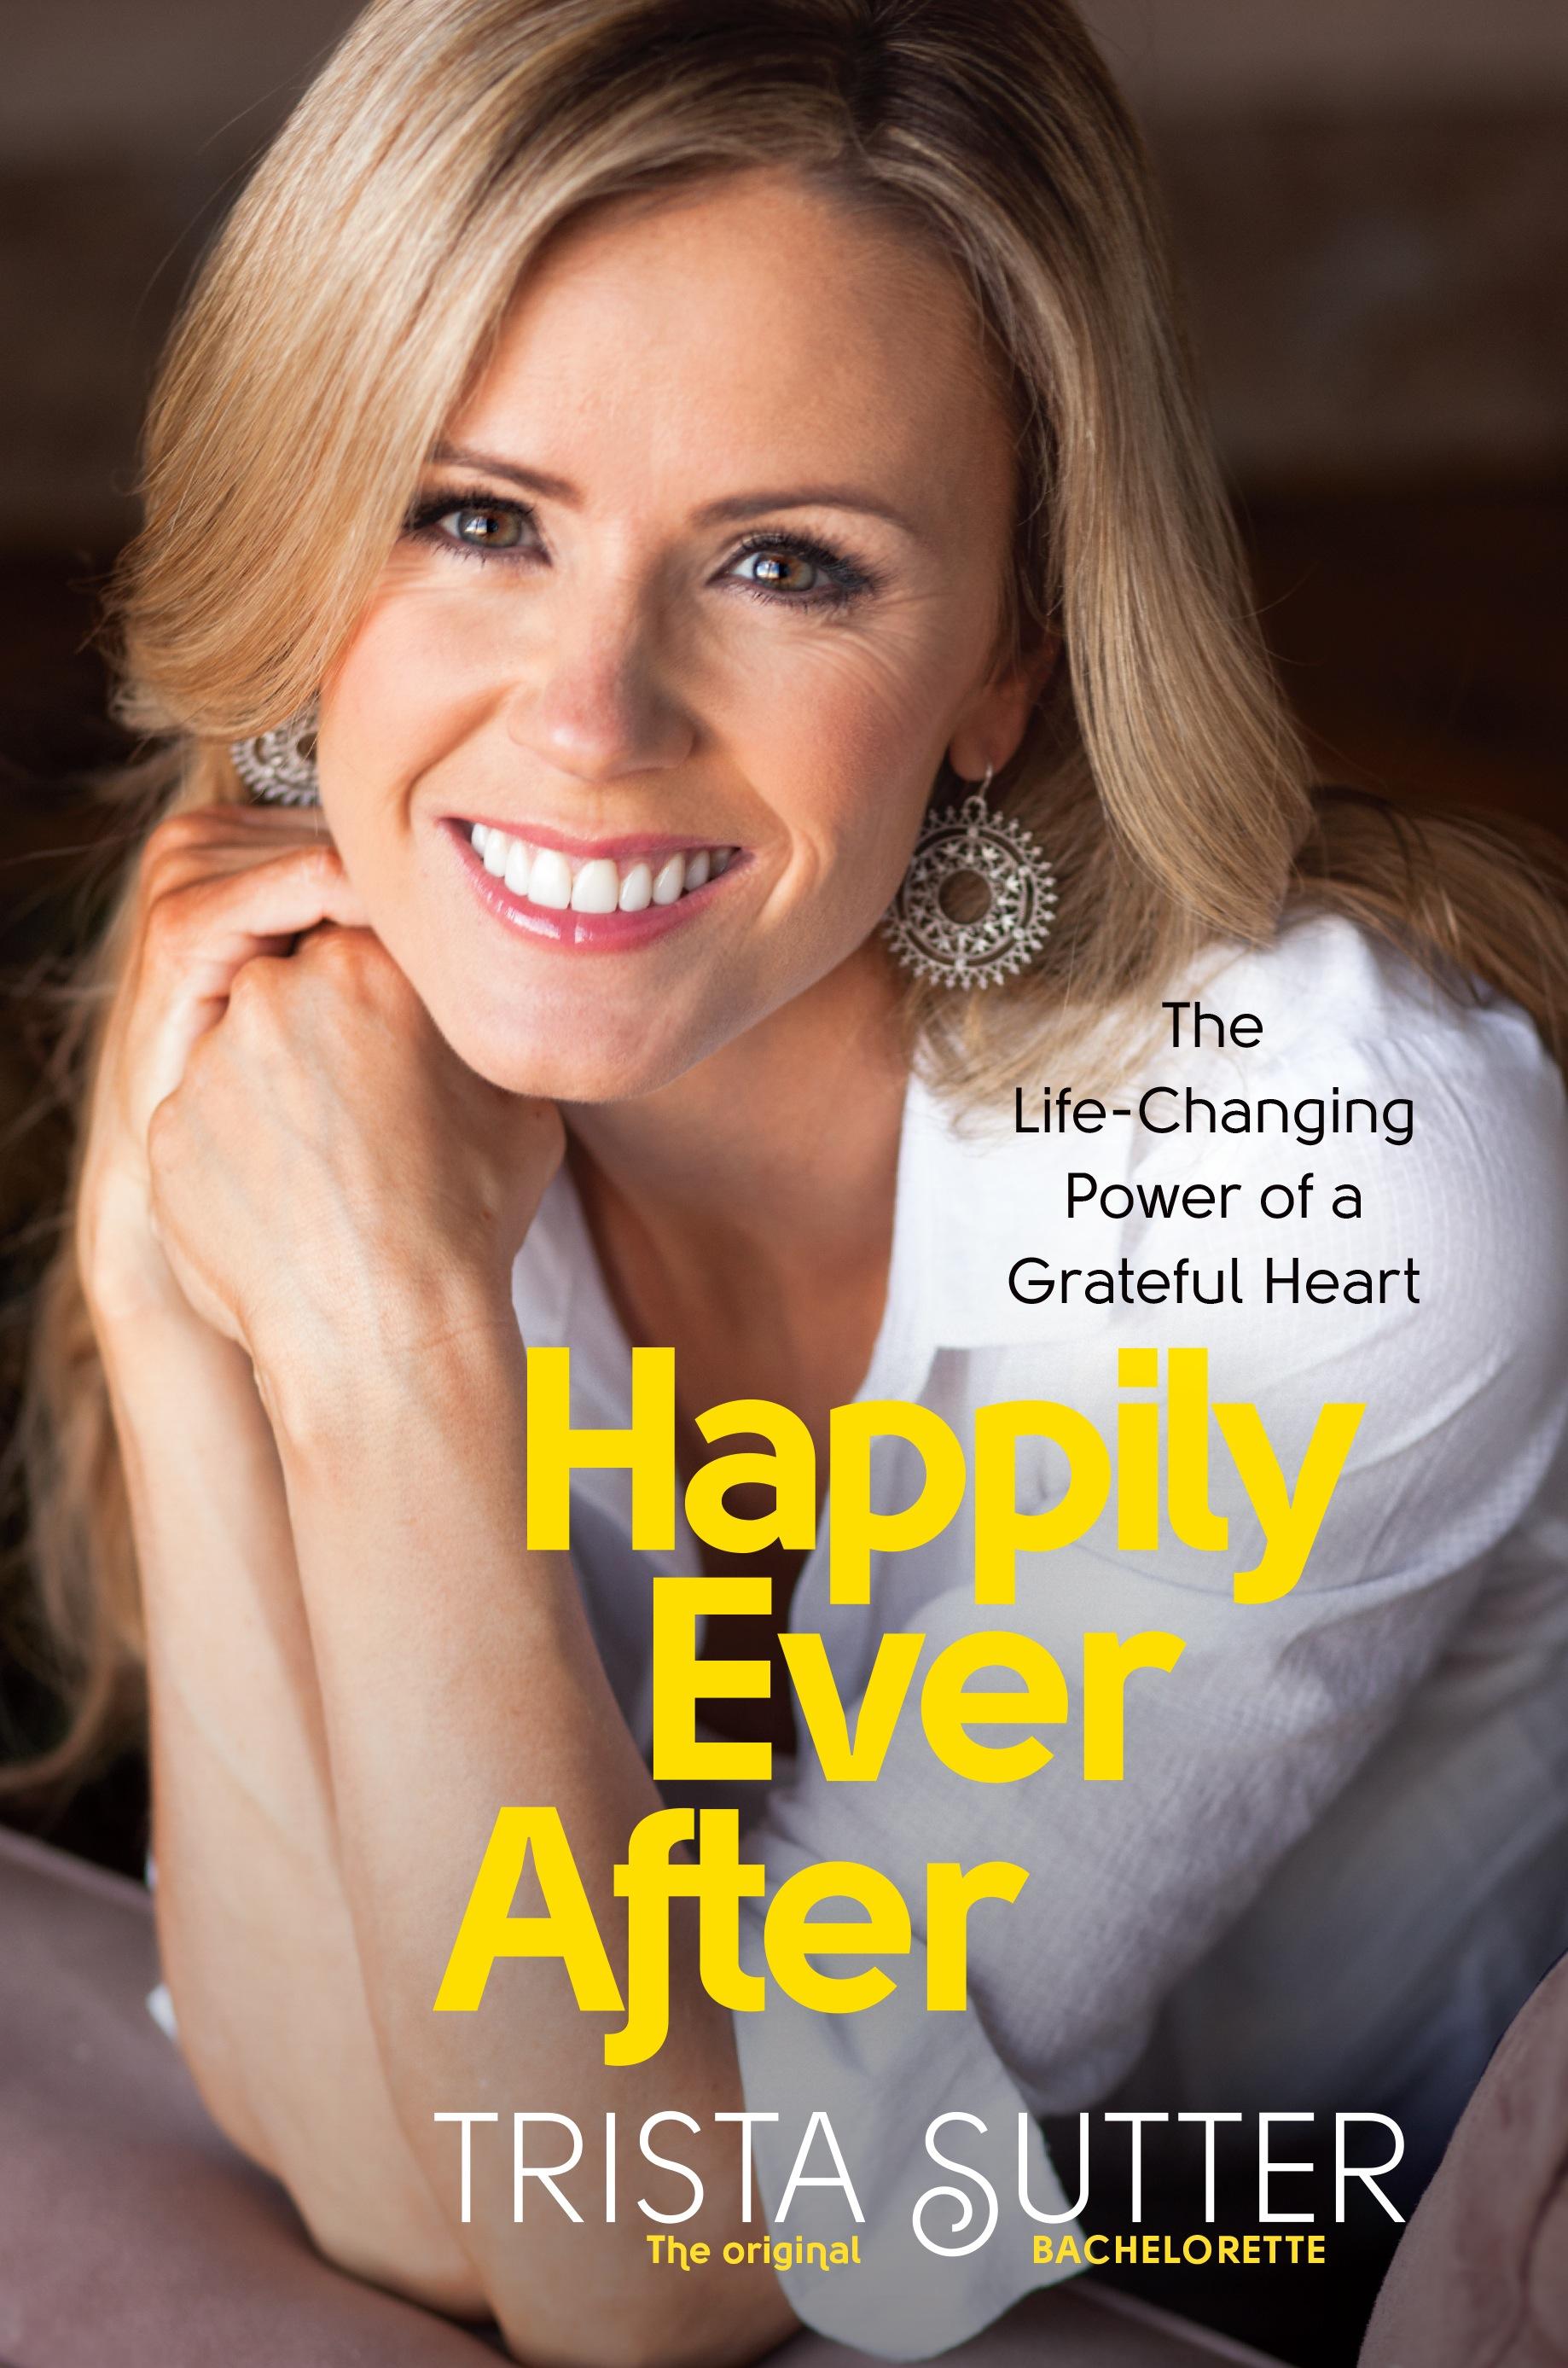 Trista Sutter book cover